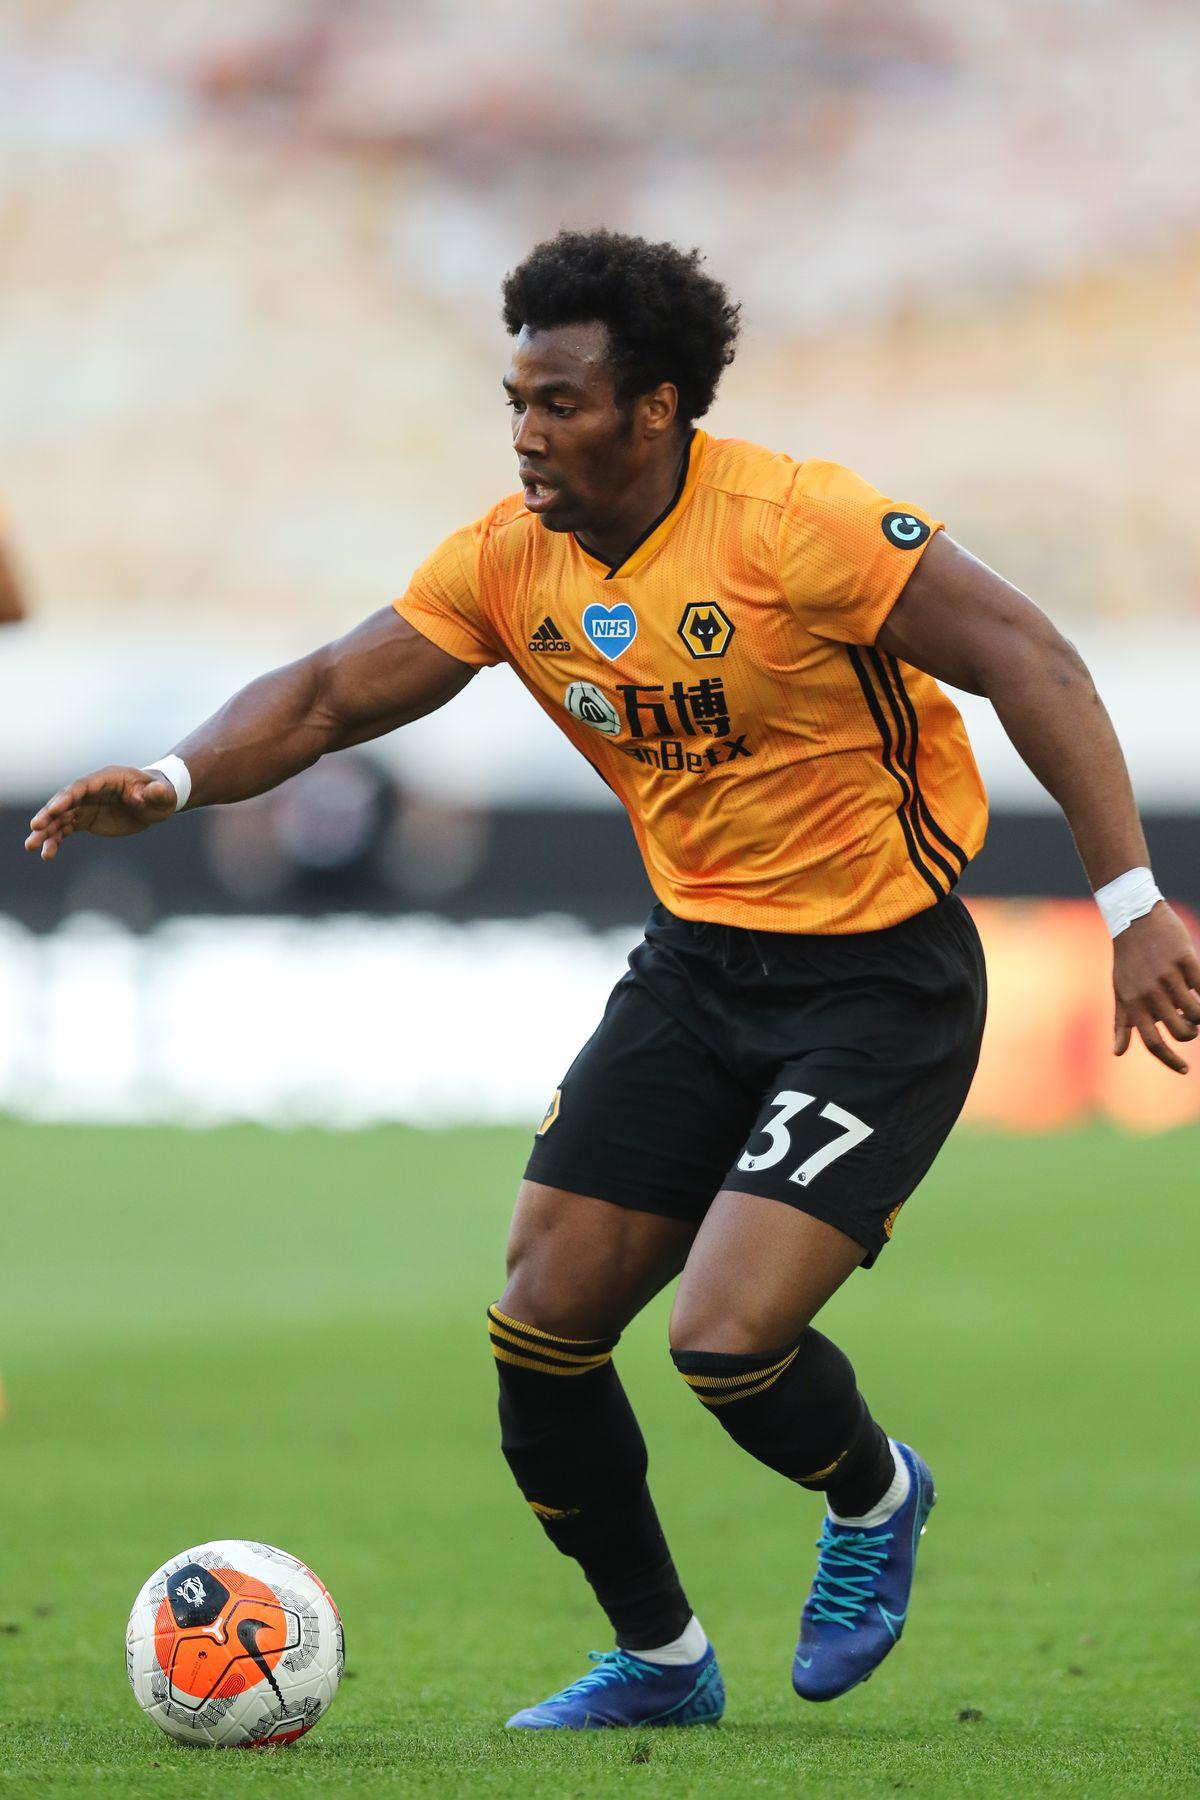 Wolverhampton Wanderers v AFC Bournemouth - Premier League